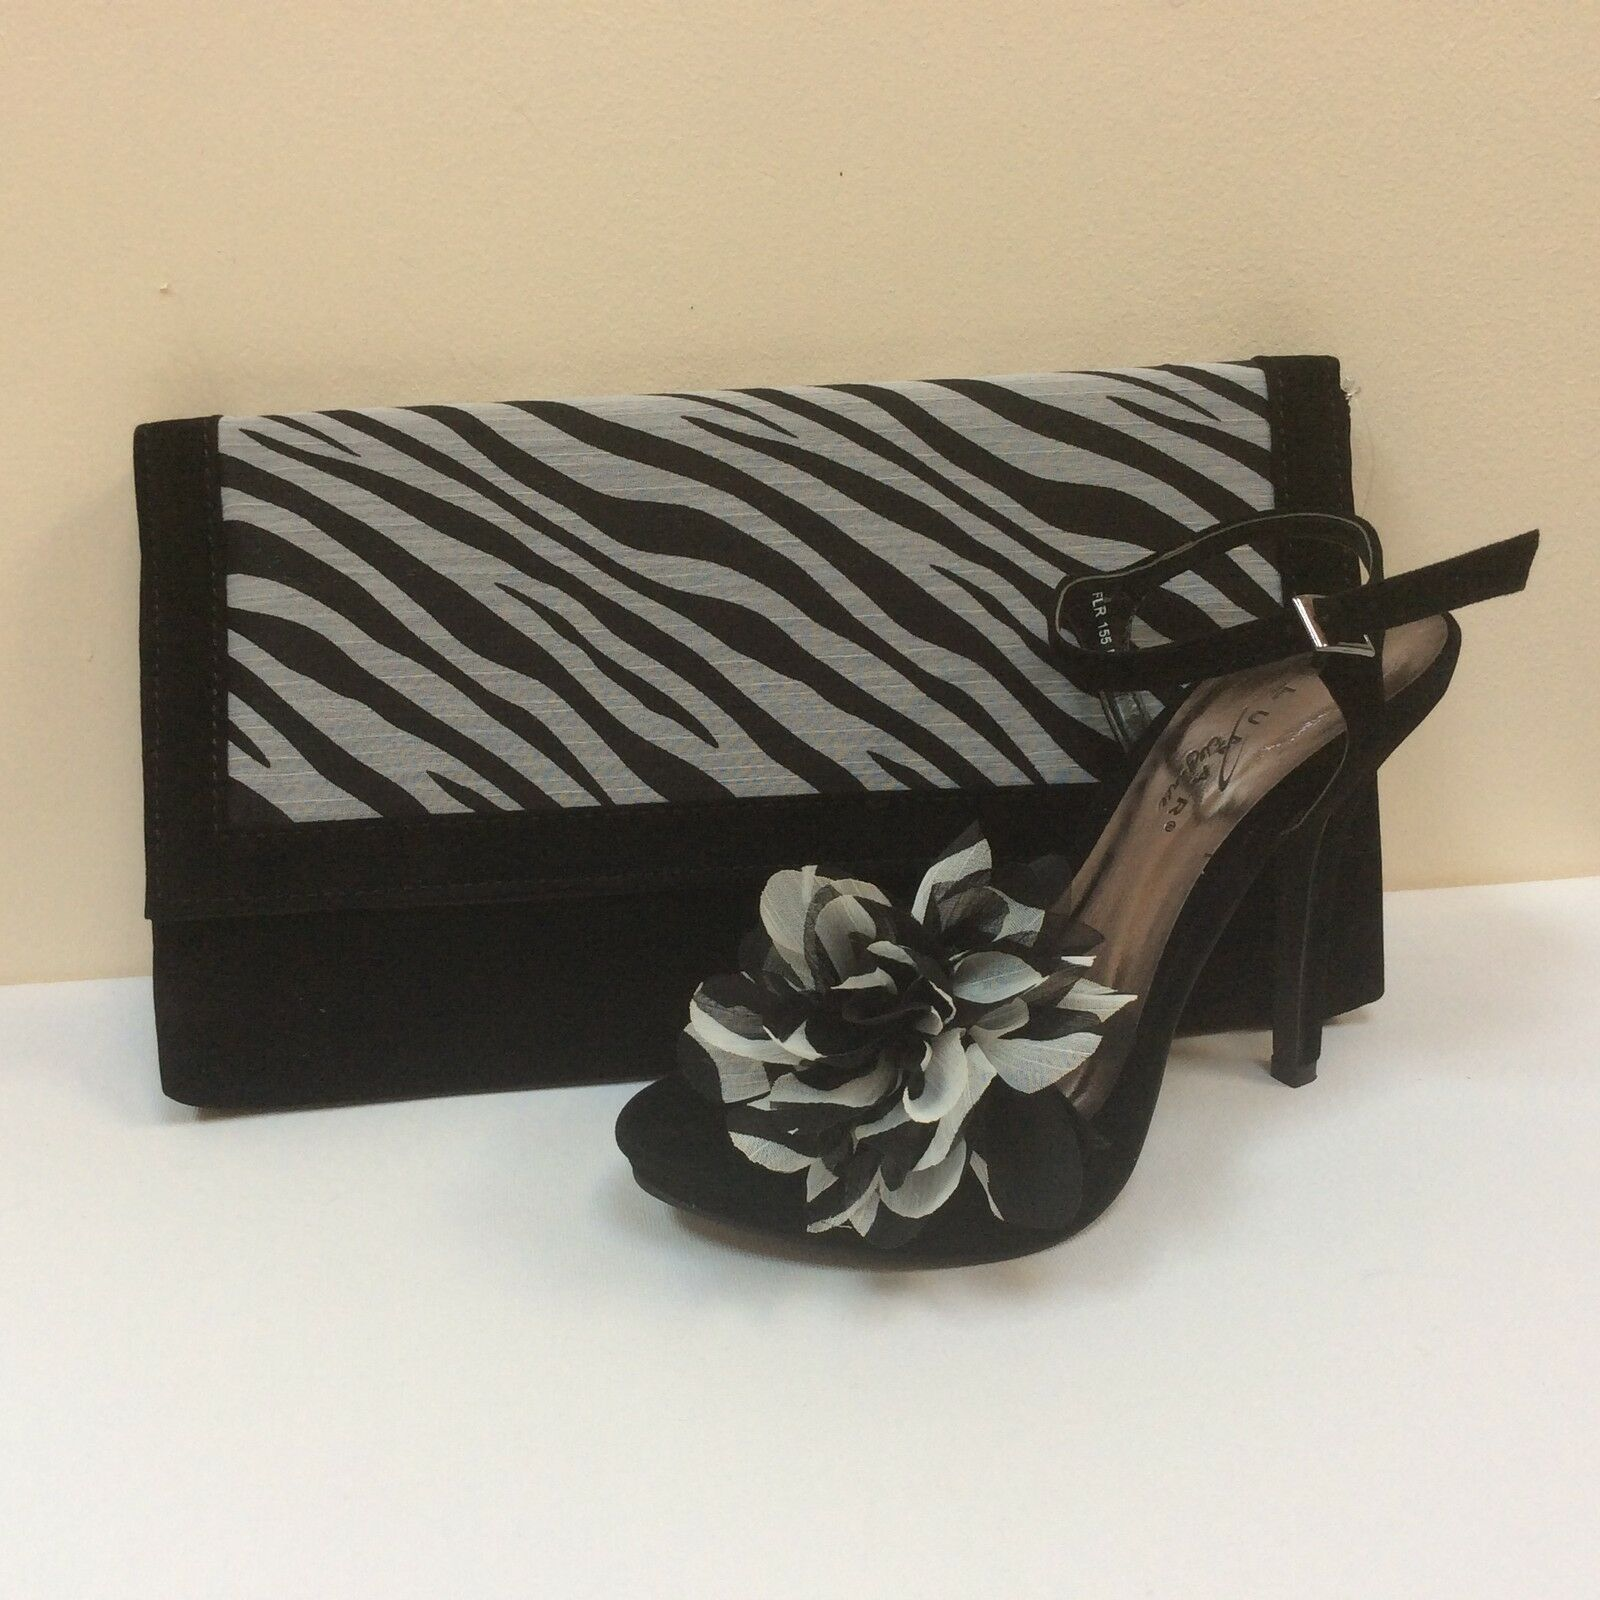 Lunar schwarz faux suede platform Sandale & matching bag, UK 3/EU 36, BNWB